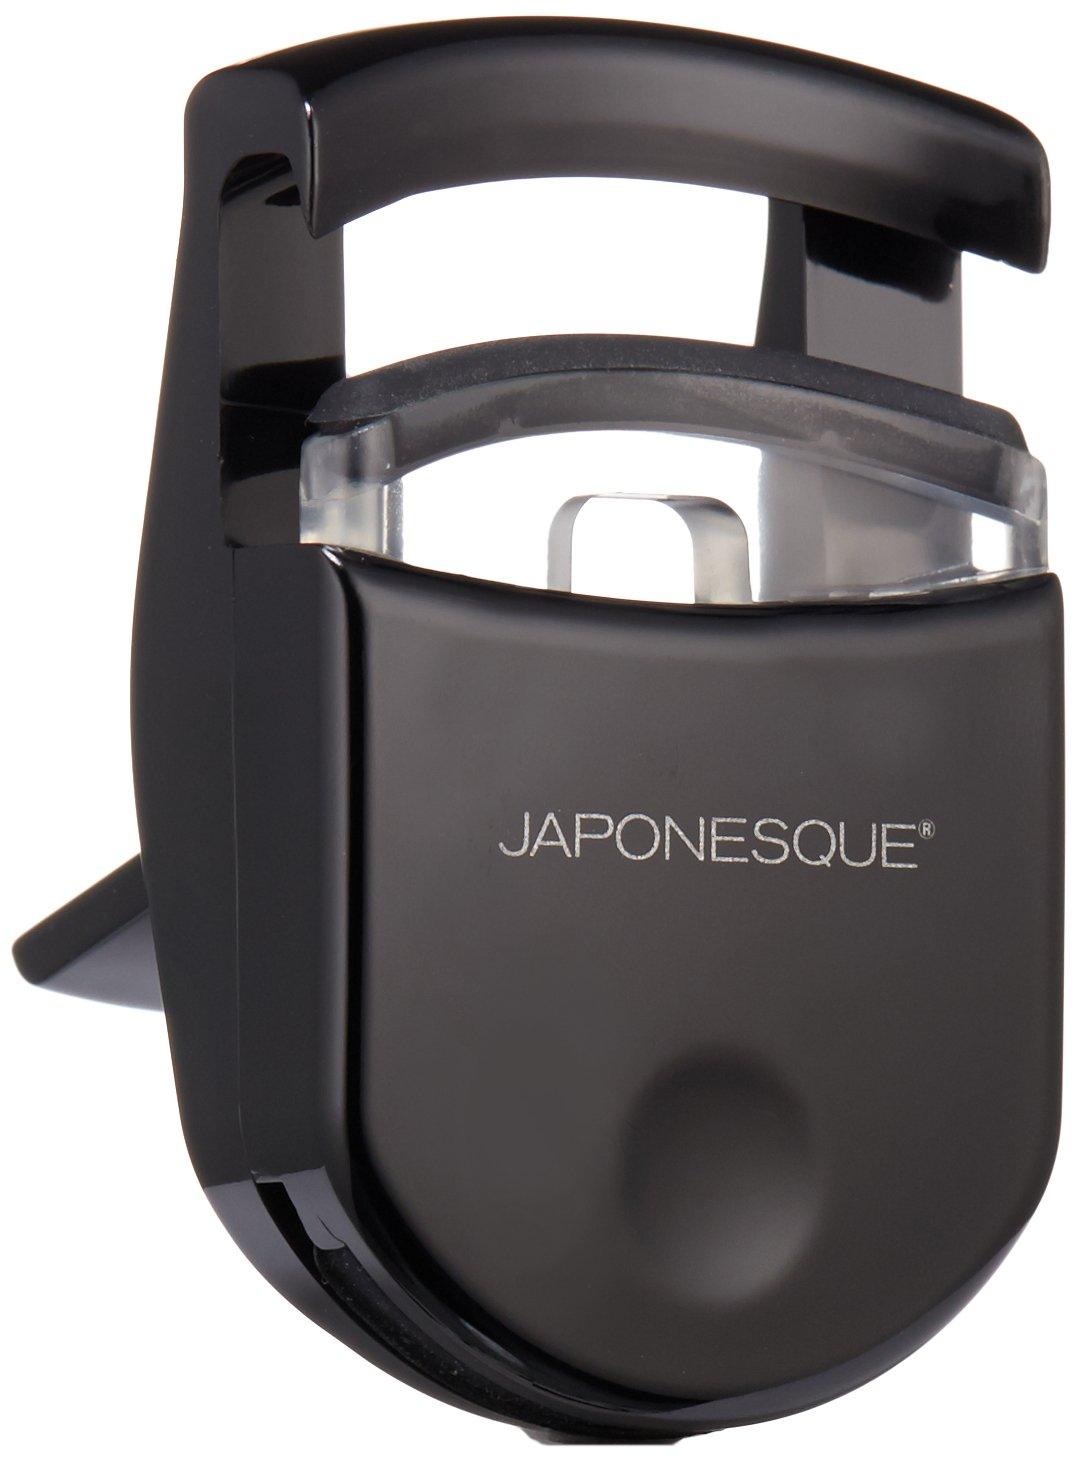 Buy Go Curl Japonesque Eyelash Curler Now!